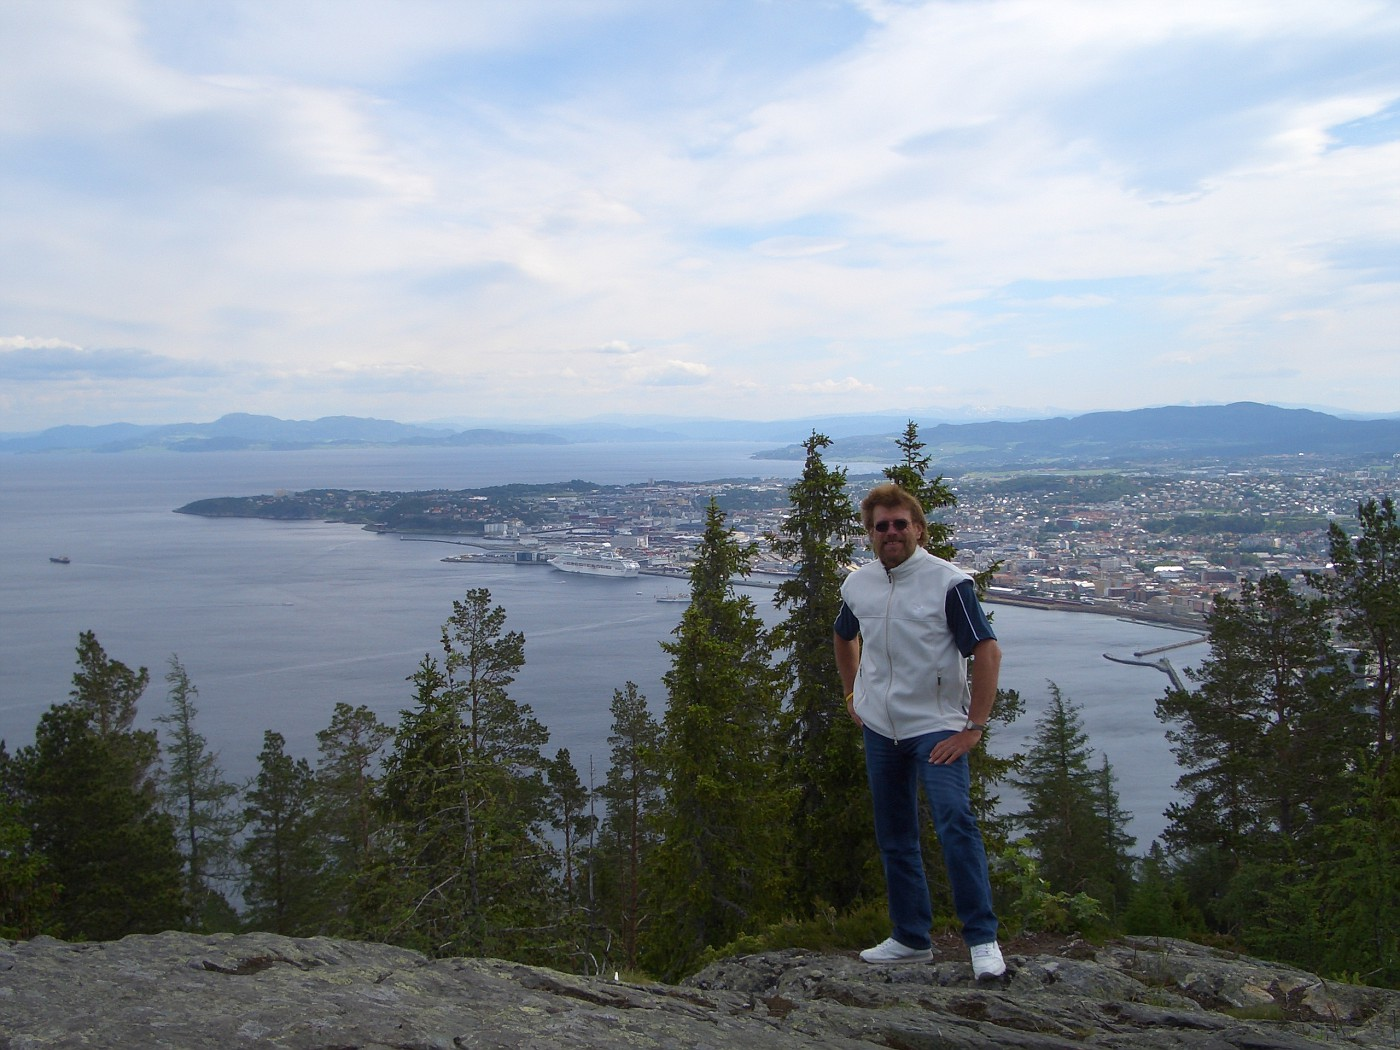 Manfred am Trondheim-Fjord